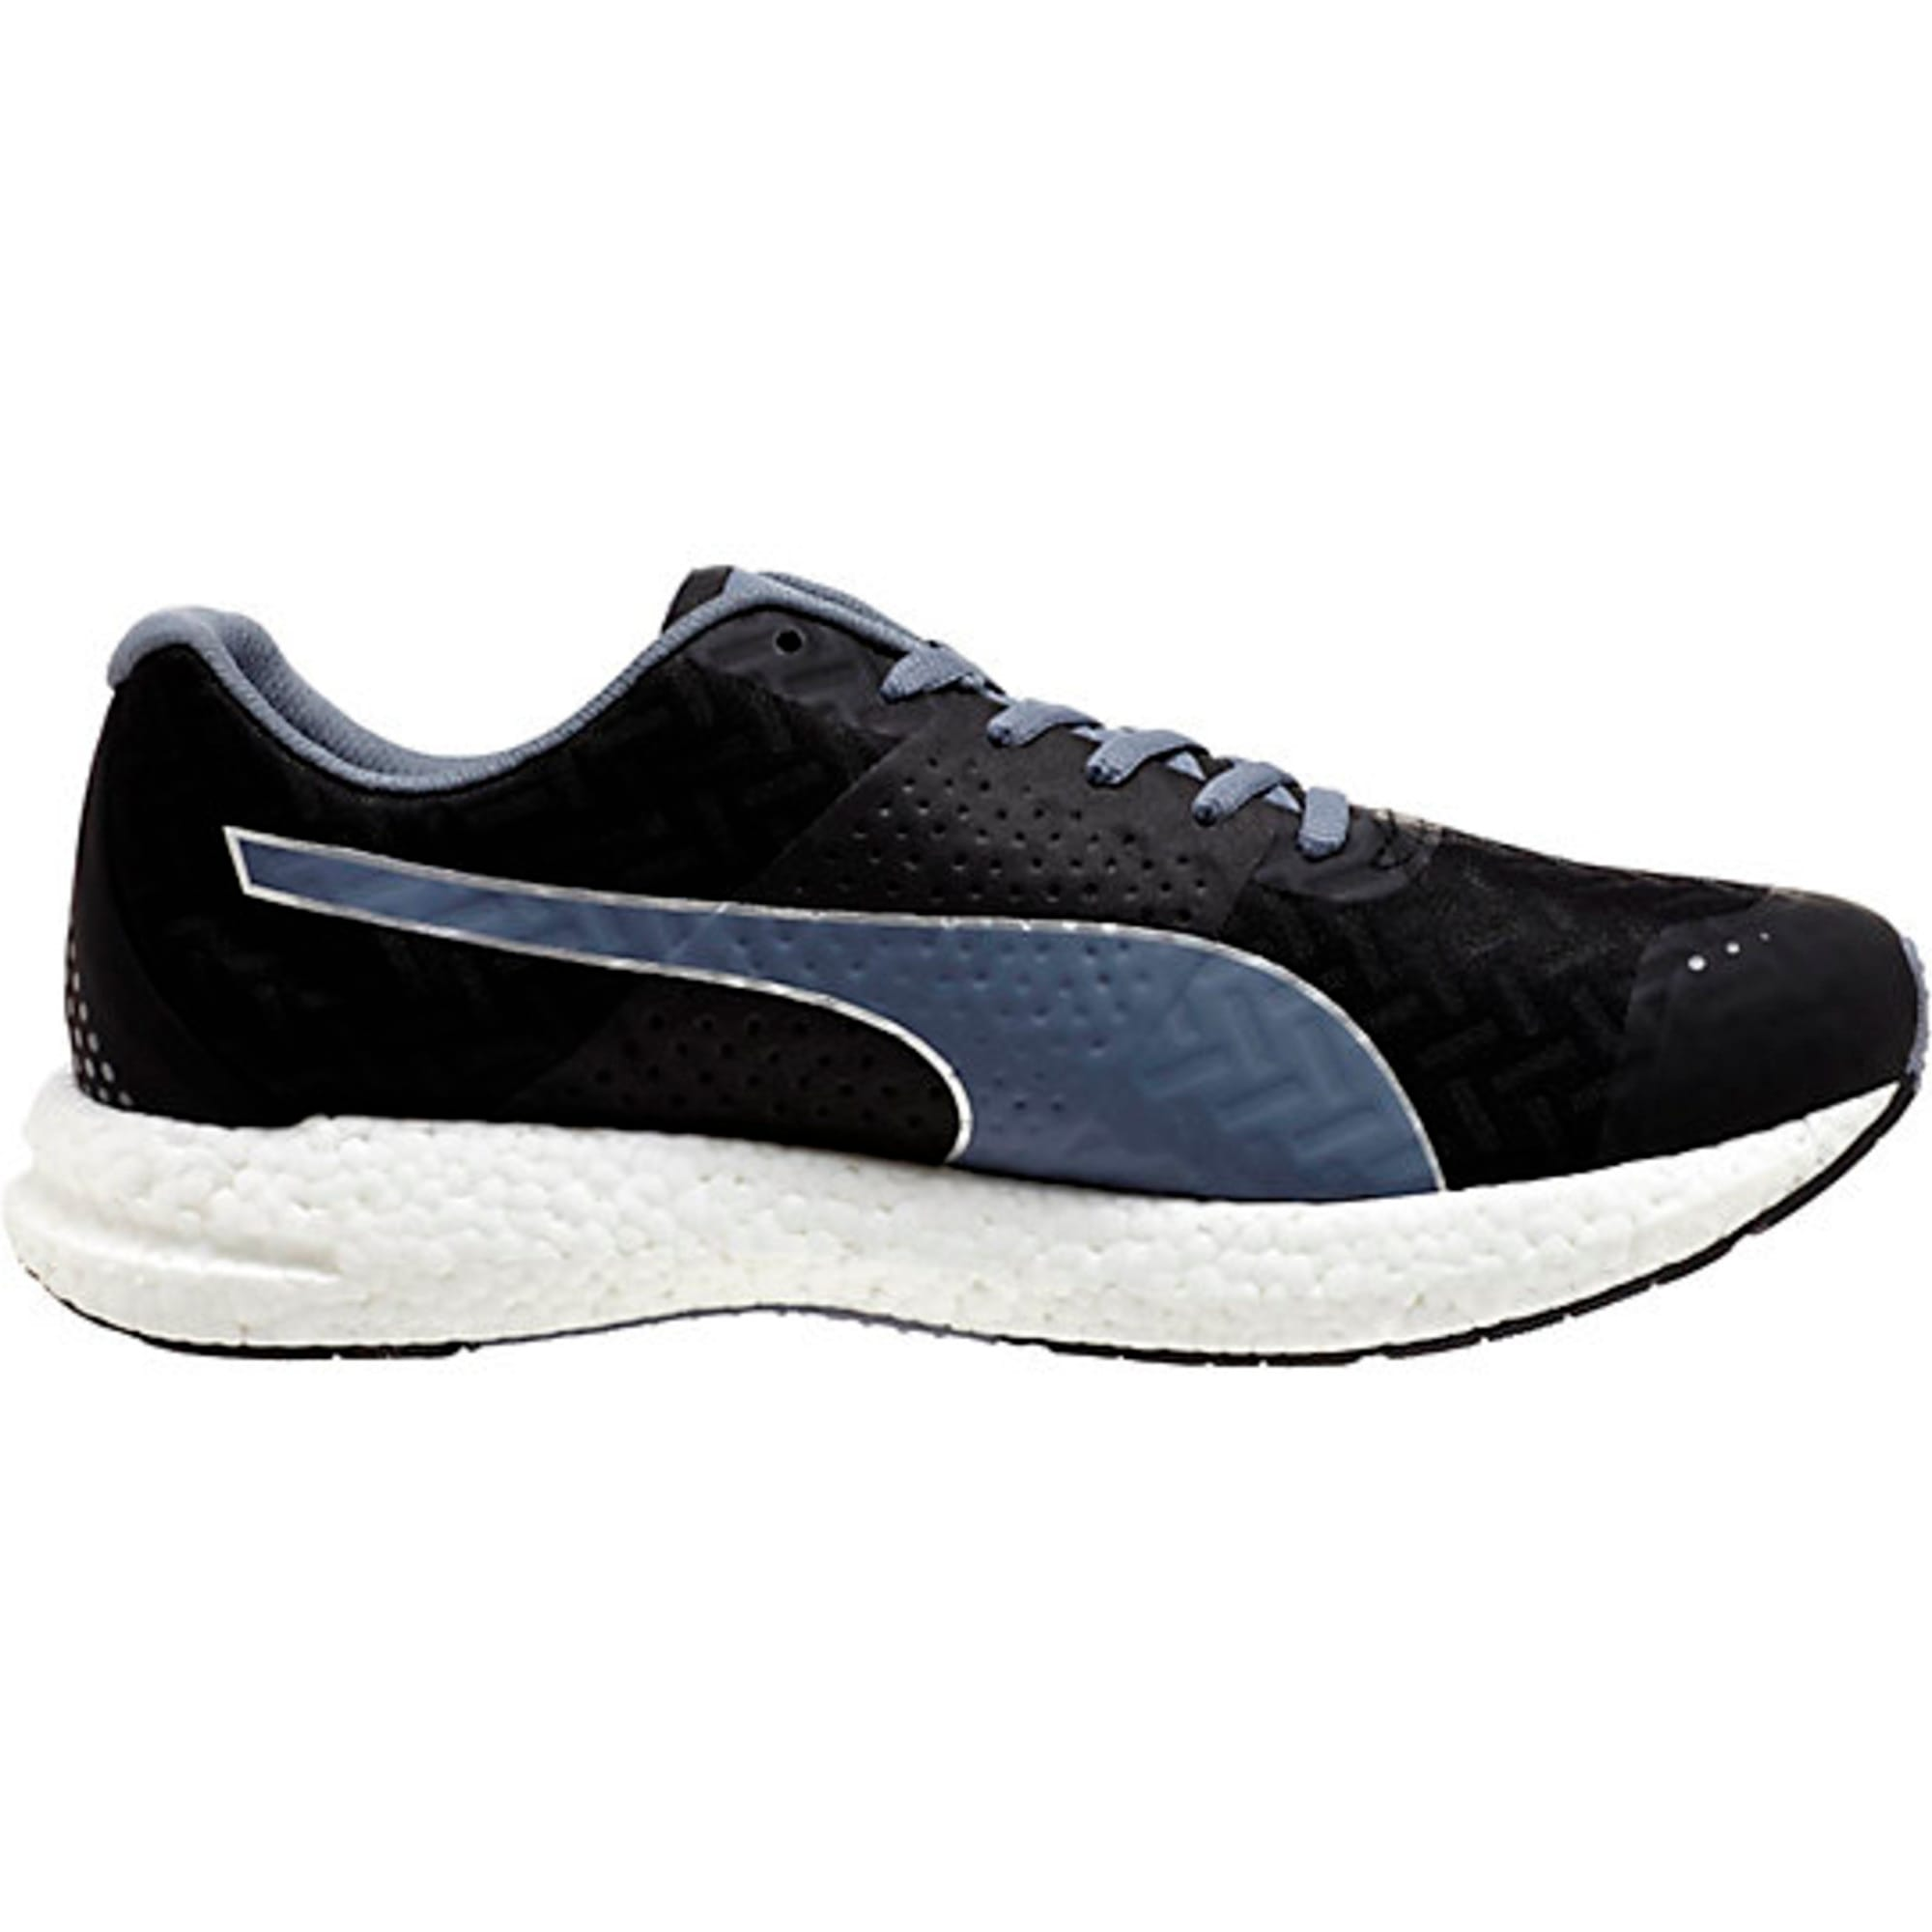 Thumbnail 4 of NRGY Running Shoes, black-folkstone gray, medium-IND